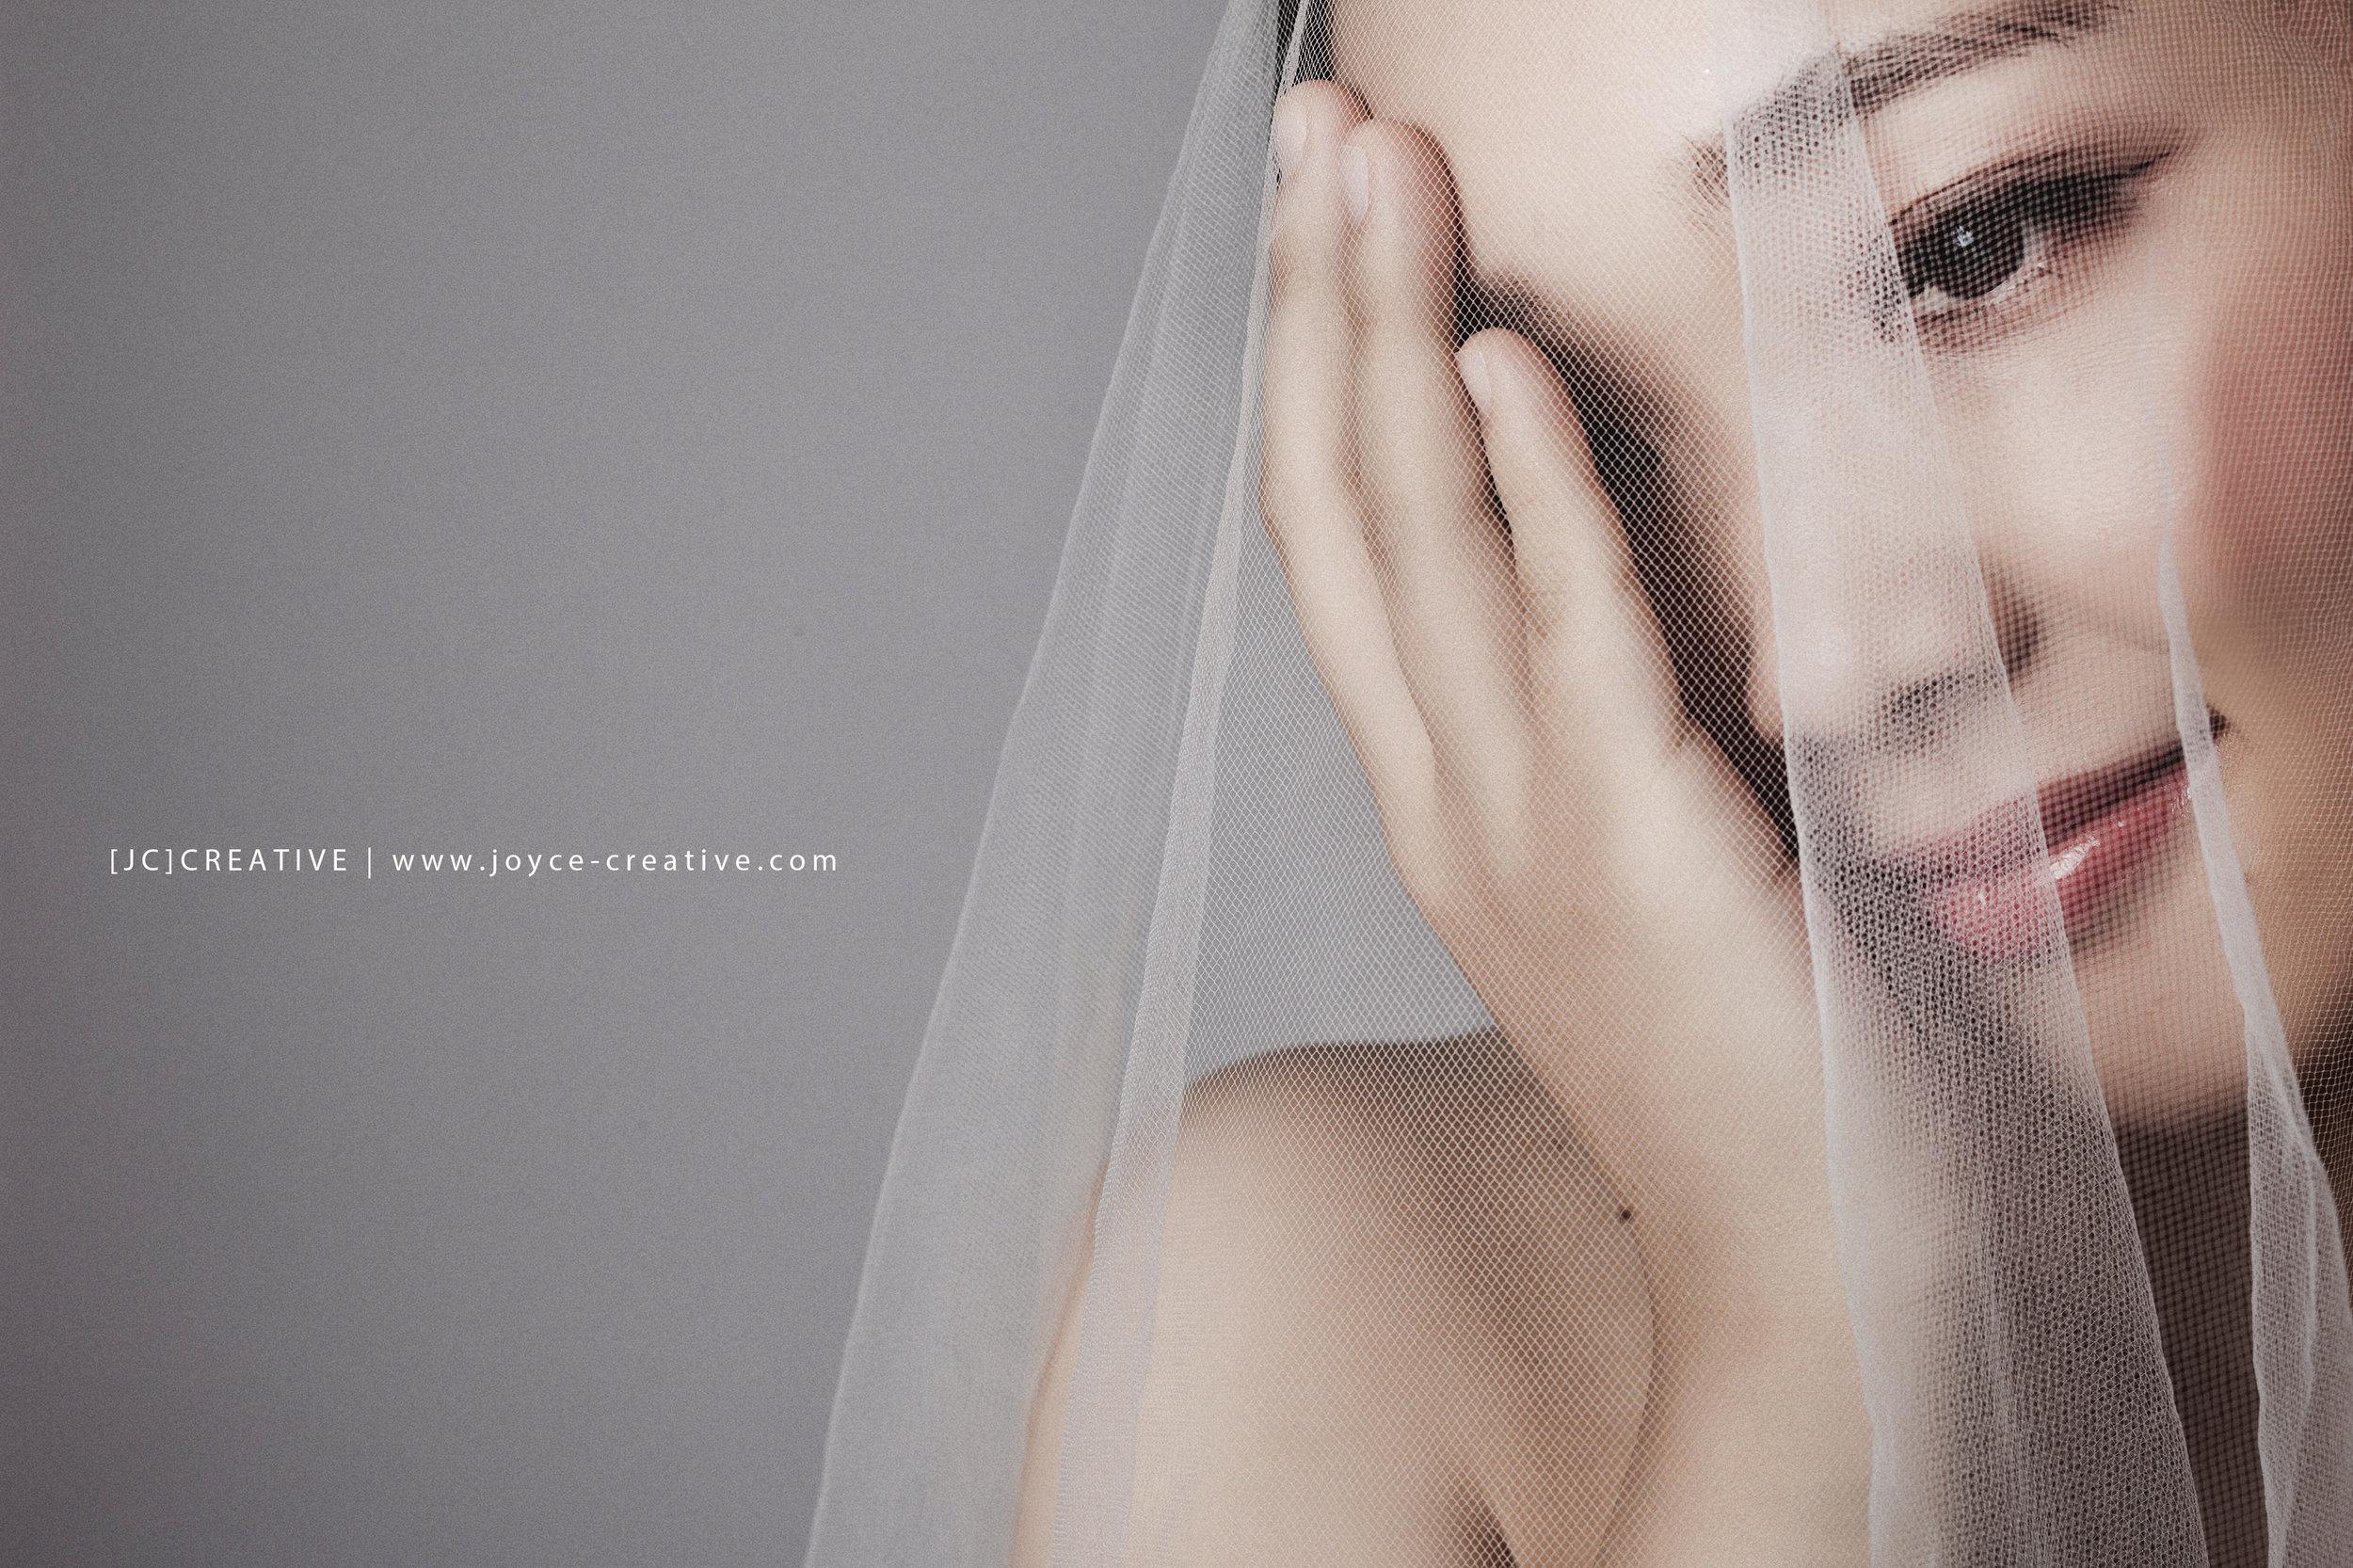 [JC]CREATIVE 女性攝影師  自主婚紗 自助婚紗 台灣WEDDING PRE-WEDDING MOTIVES 自然風格 STUDIOSHOOT SIMPILE LOVE 禮服工未作室喵咪睫毛     圖像00001.JPG